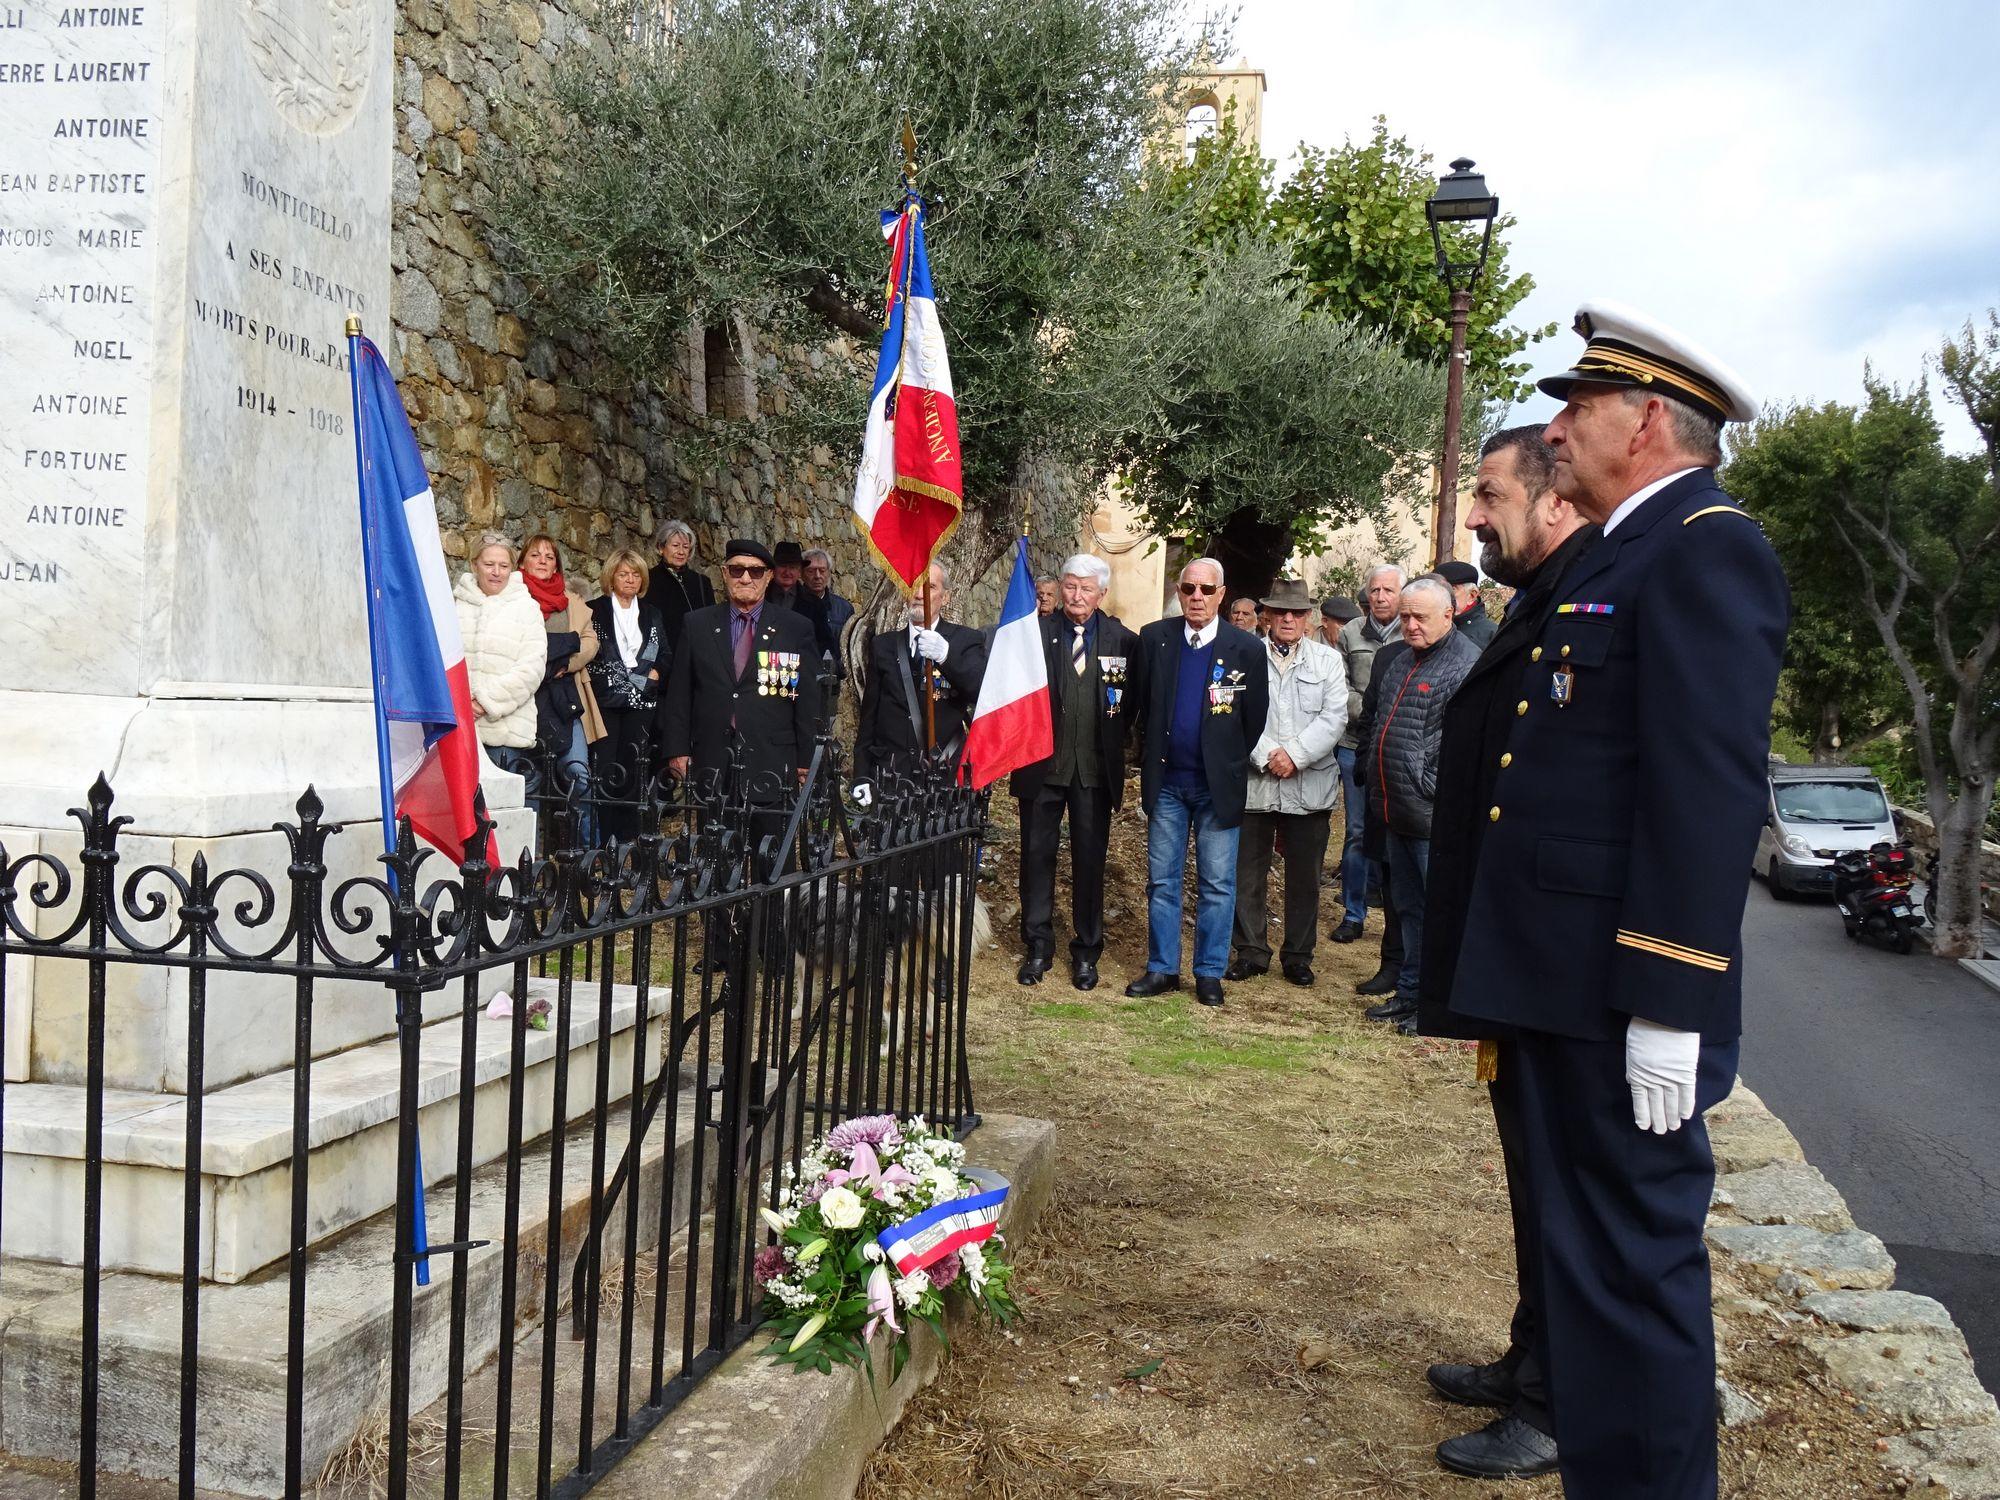 La FNACA Haute-Corse célèbre l'armistice du 11 novembre à Monticello et Santa Reparata di Balagna